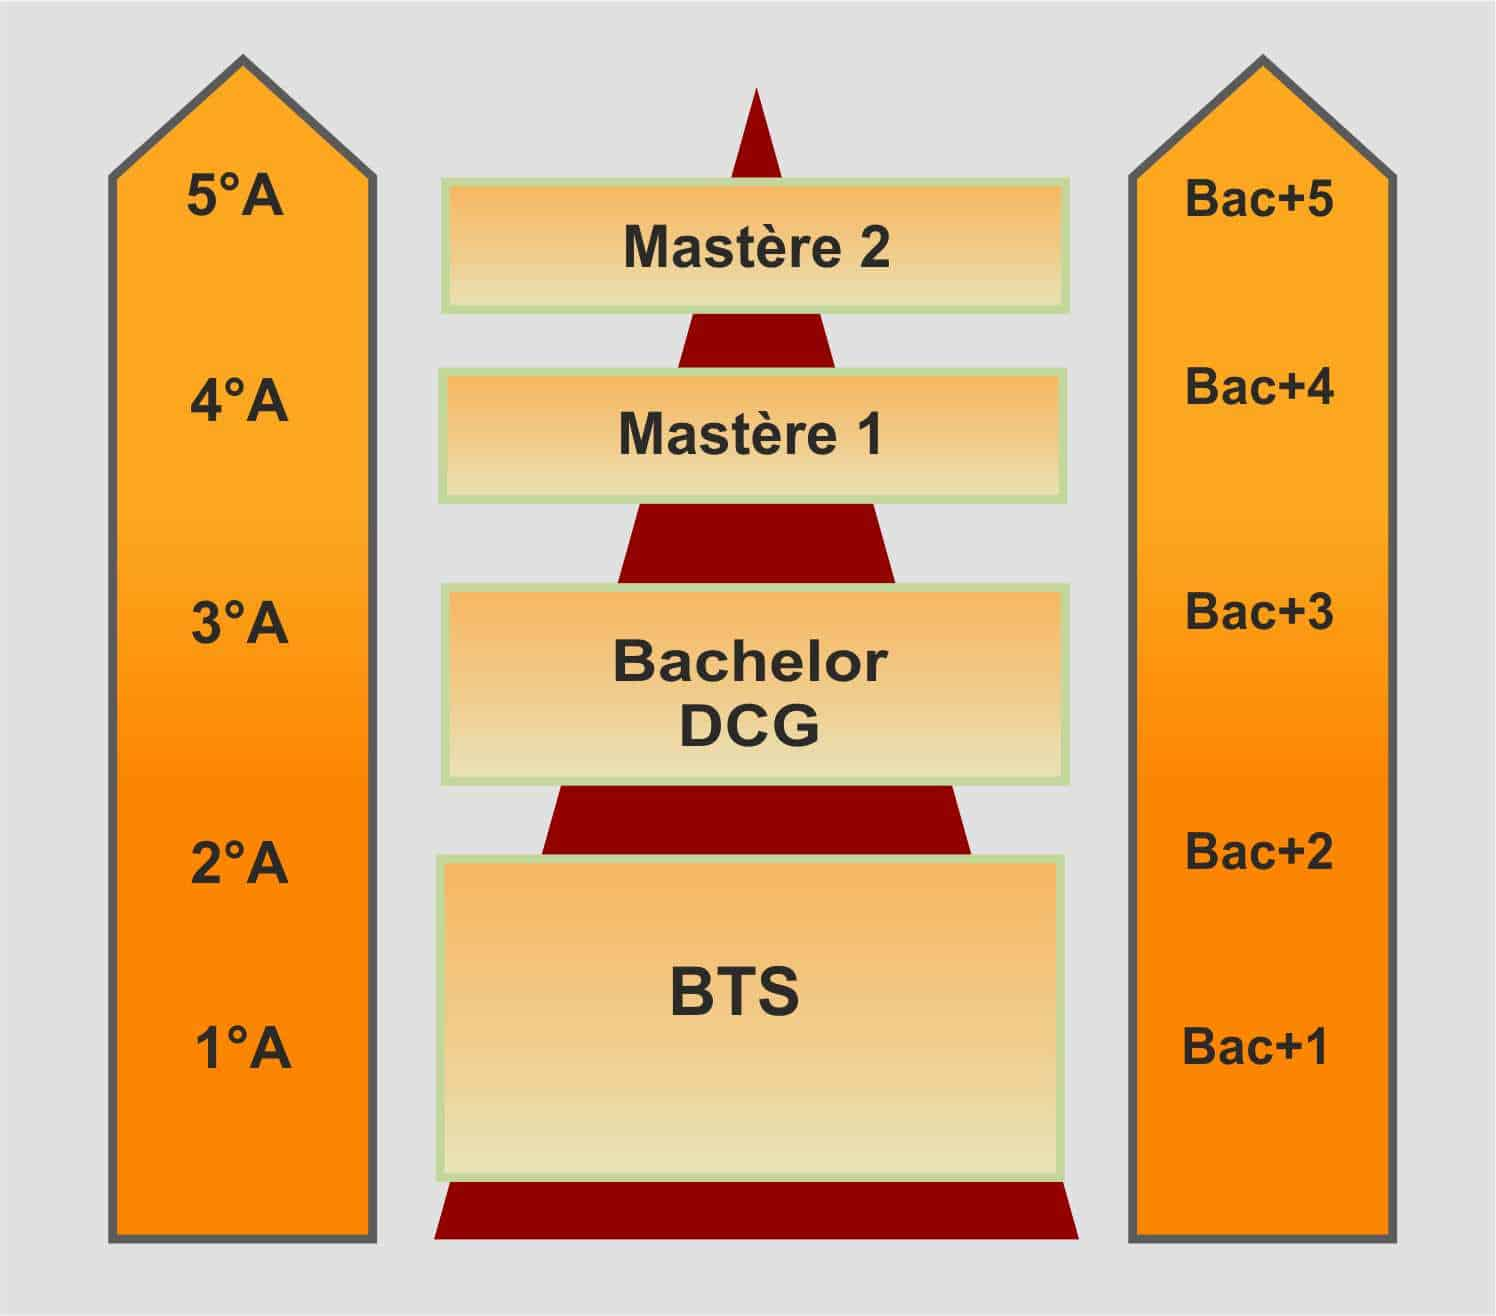 bts bachelor dcg mastere